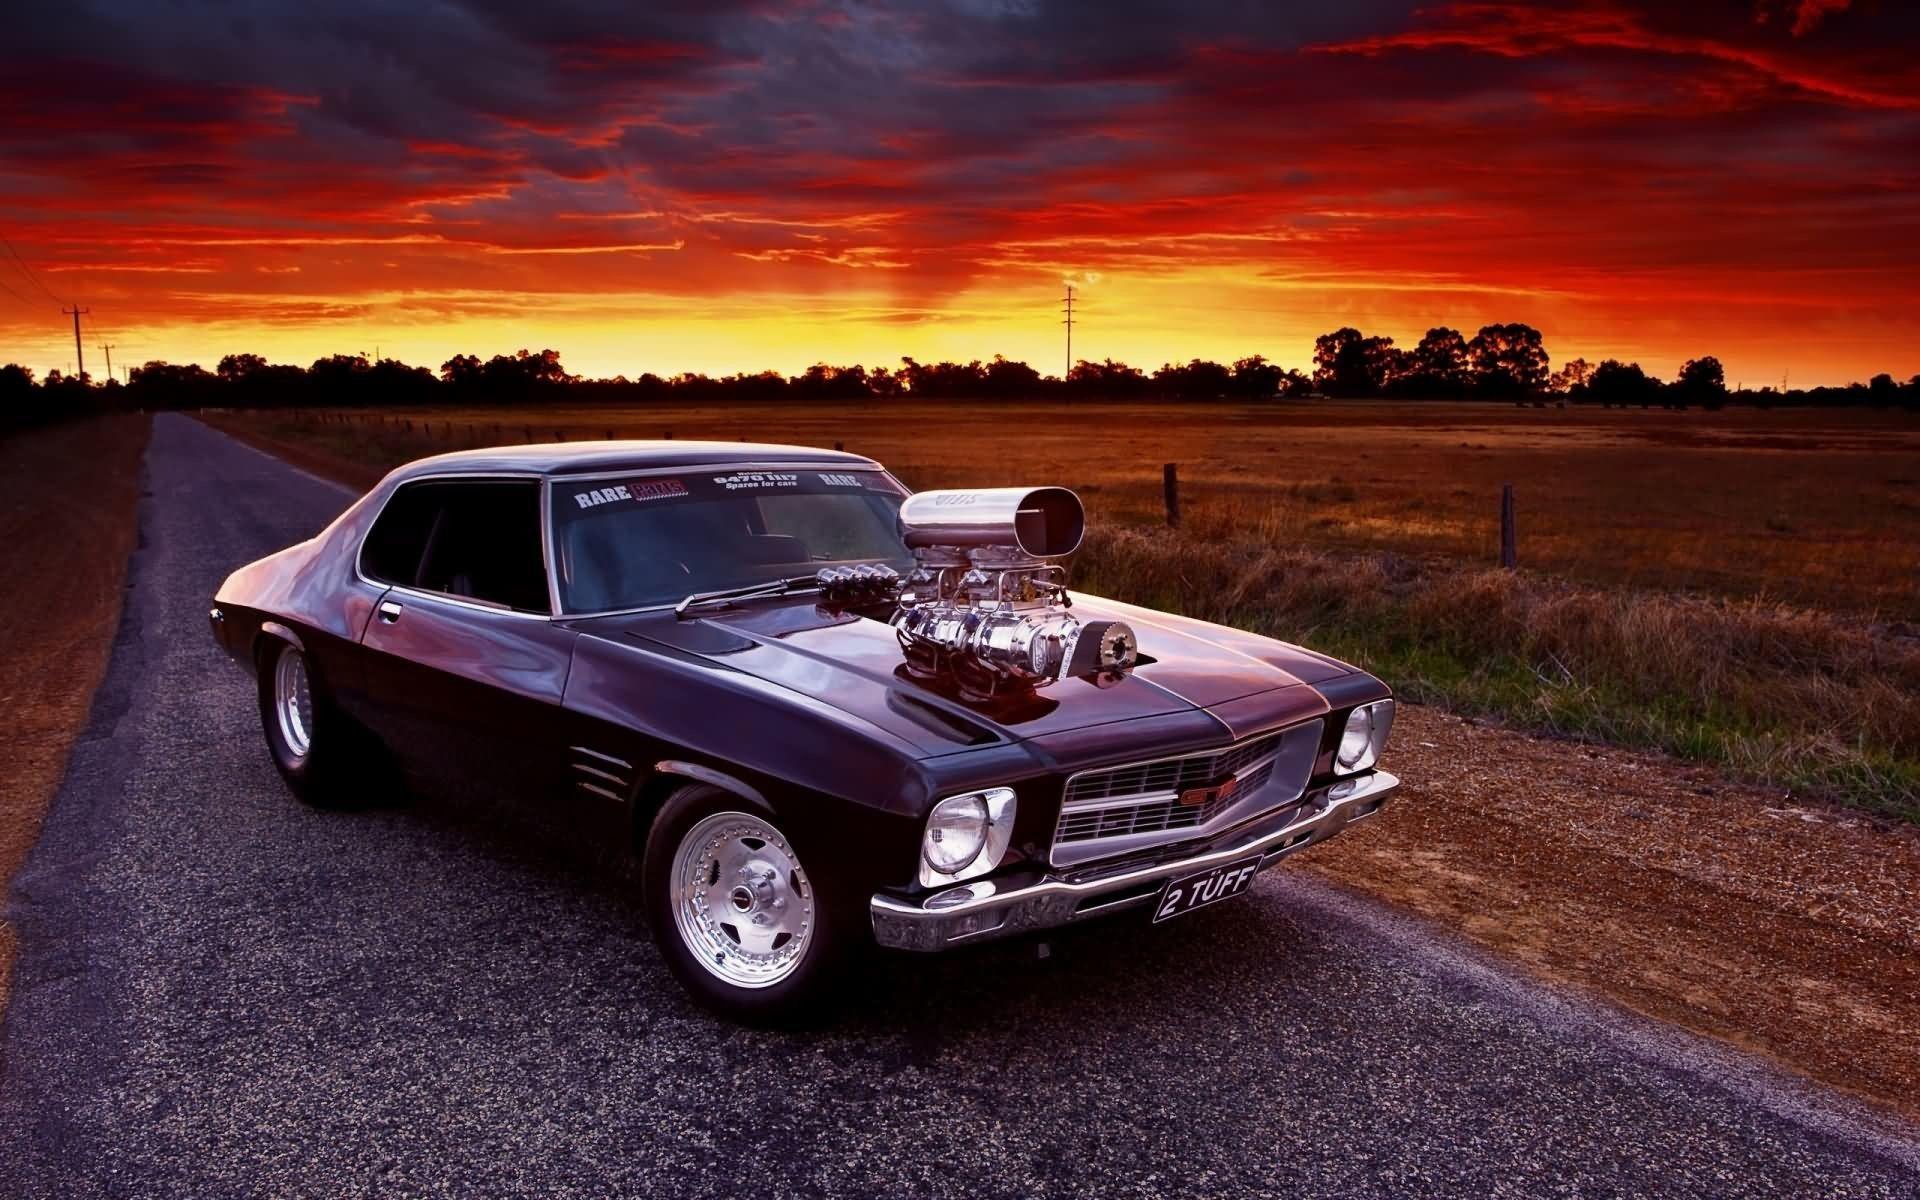 Furious Cars Wallpapers - Top Free Furious Cars Backgrounds -  WallpaperAccess